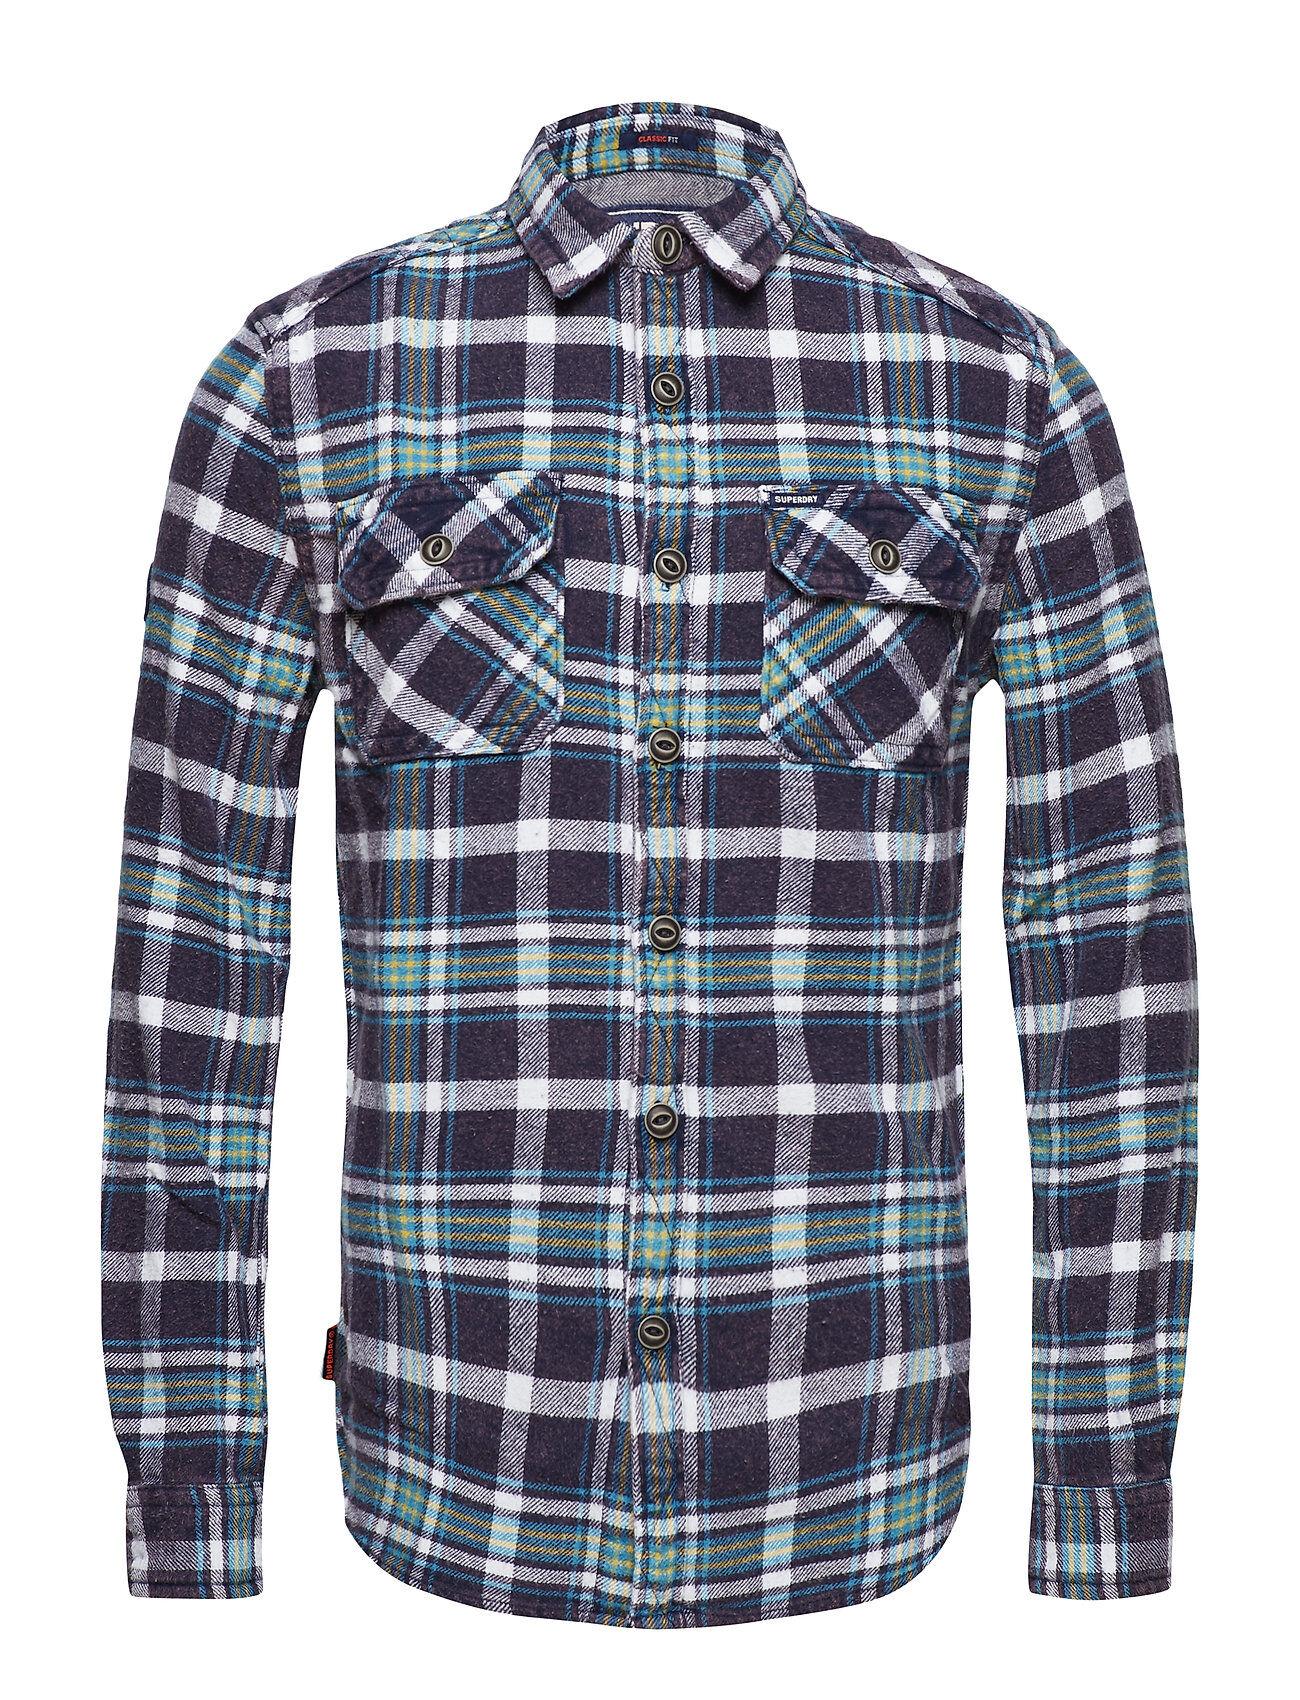 Superdry Merchant Milled Shirt Paita Rento Casual Sininen Superdry